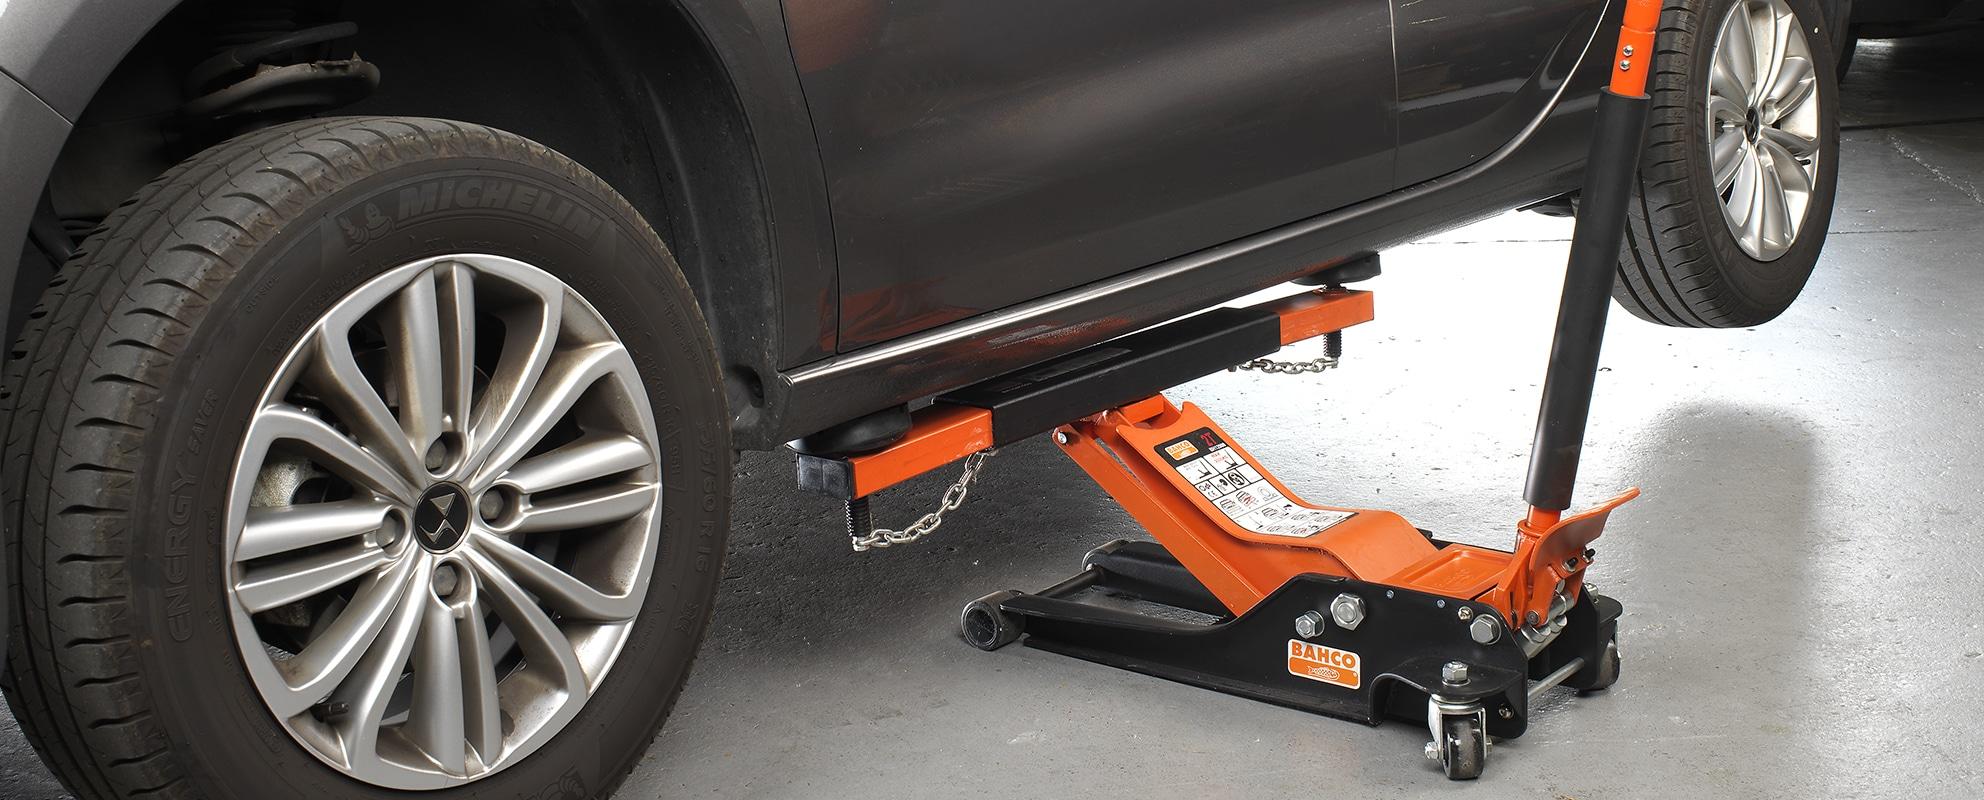 Byta däck